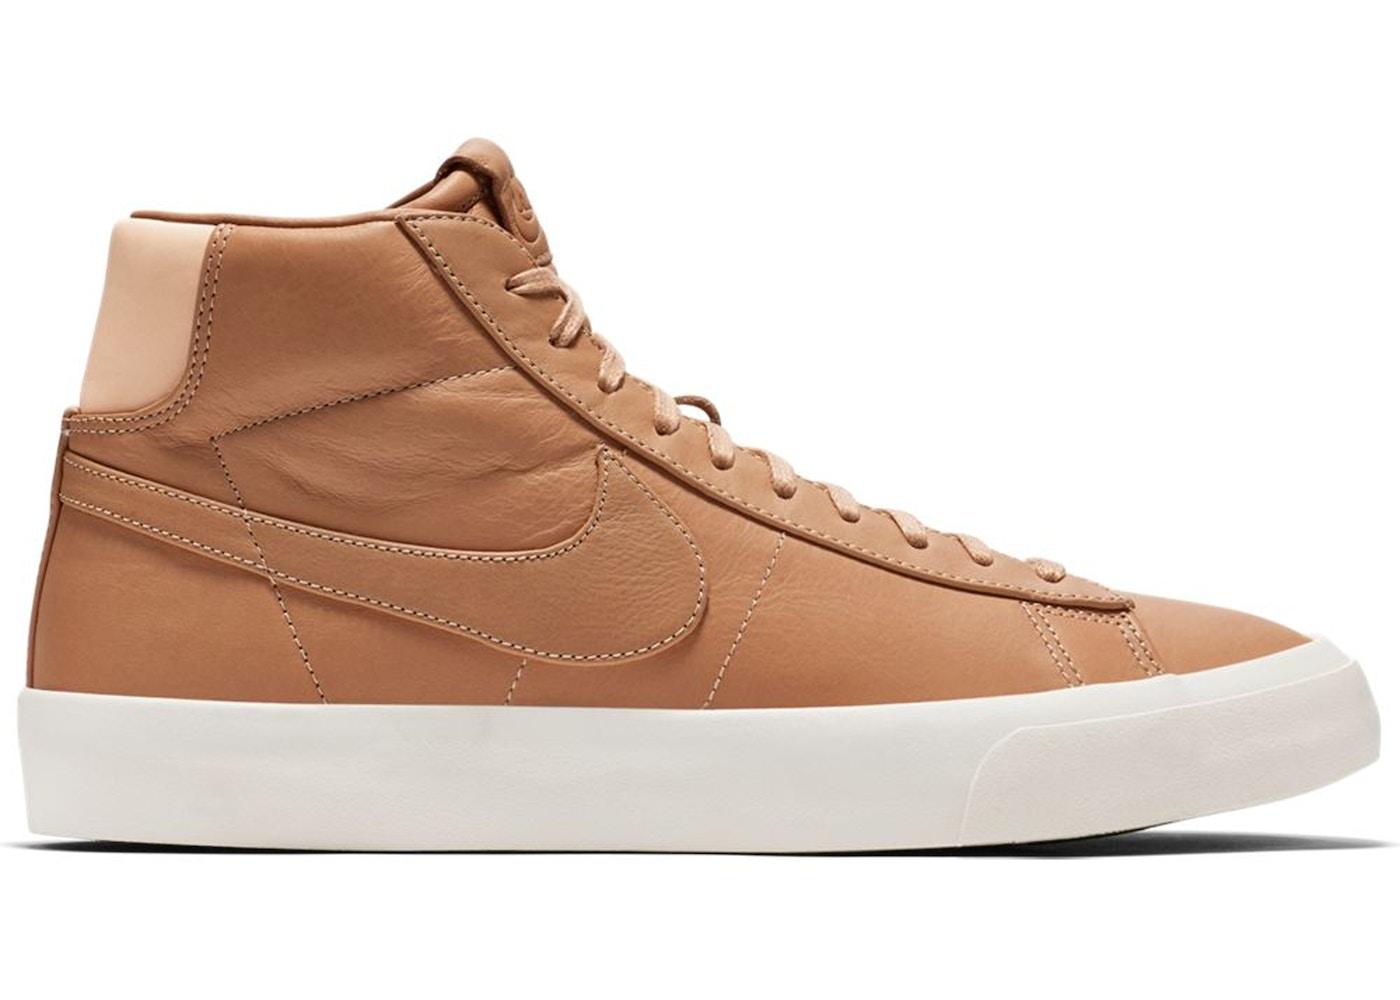 check out 2da5d a27a5 Nike Blazer Studio Mid Vachetta Tan - 904805-200